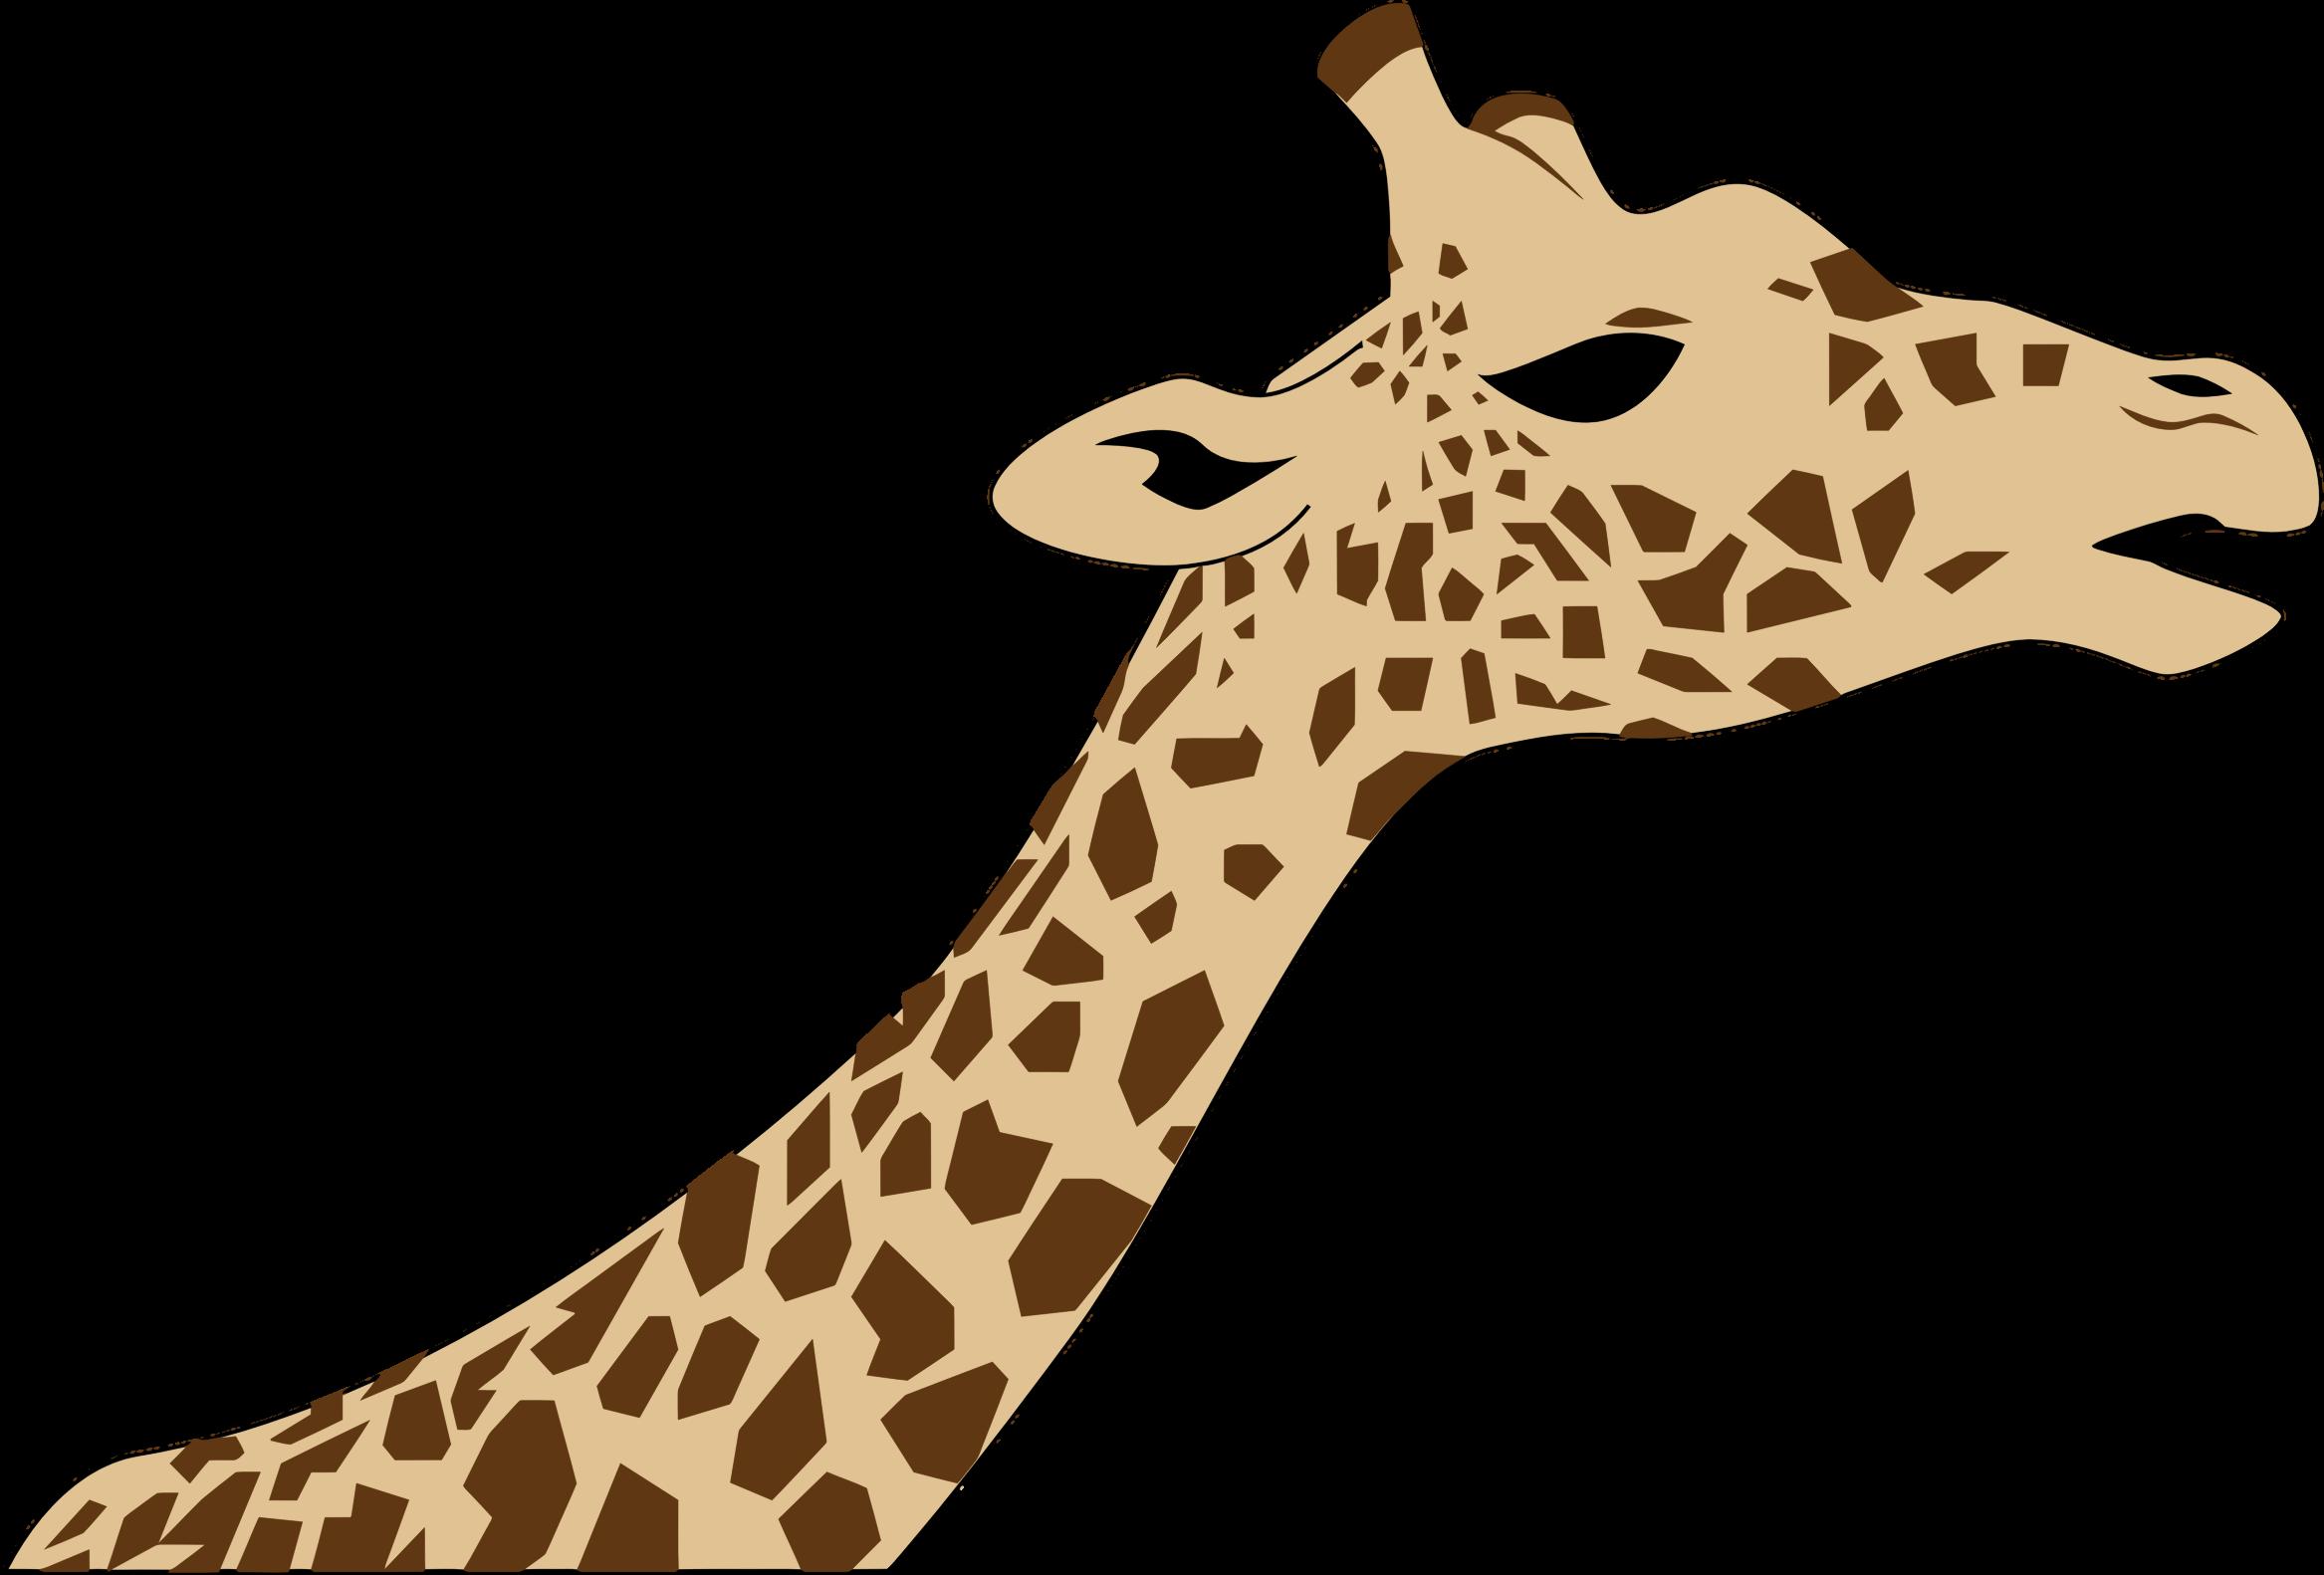 banner transparent stock Neck clipart giraffe. Head big image png.